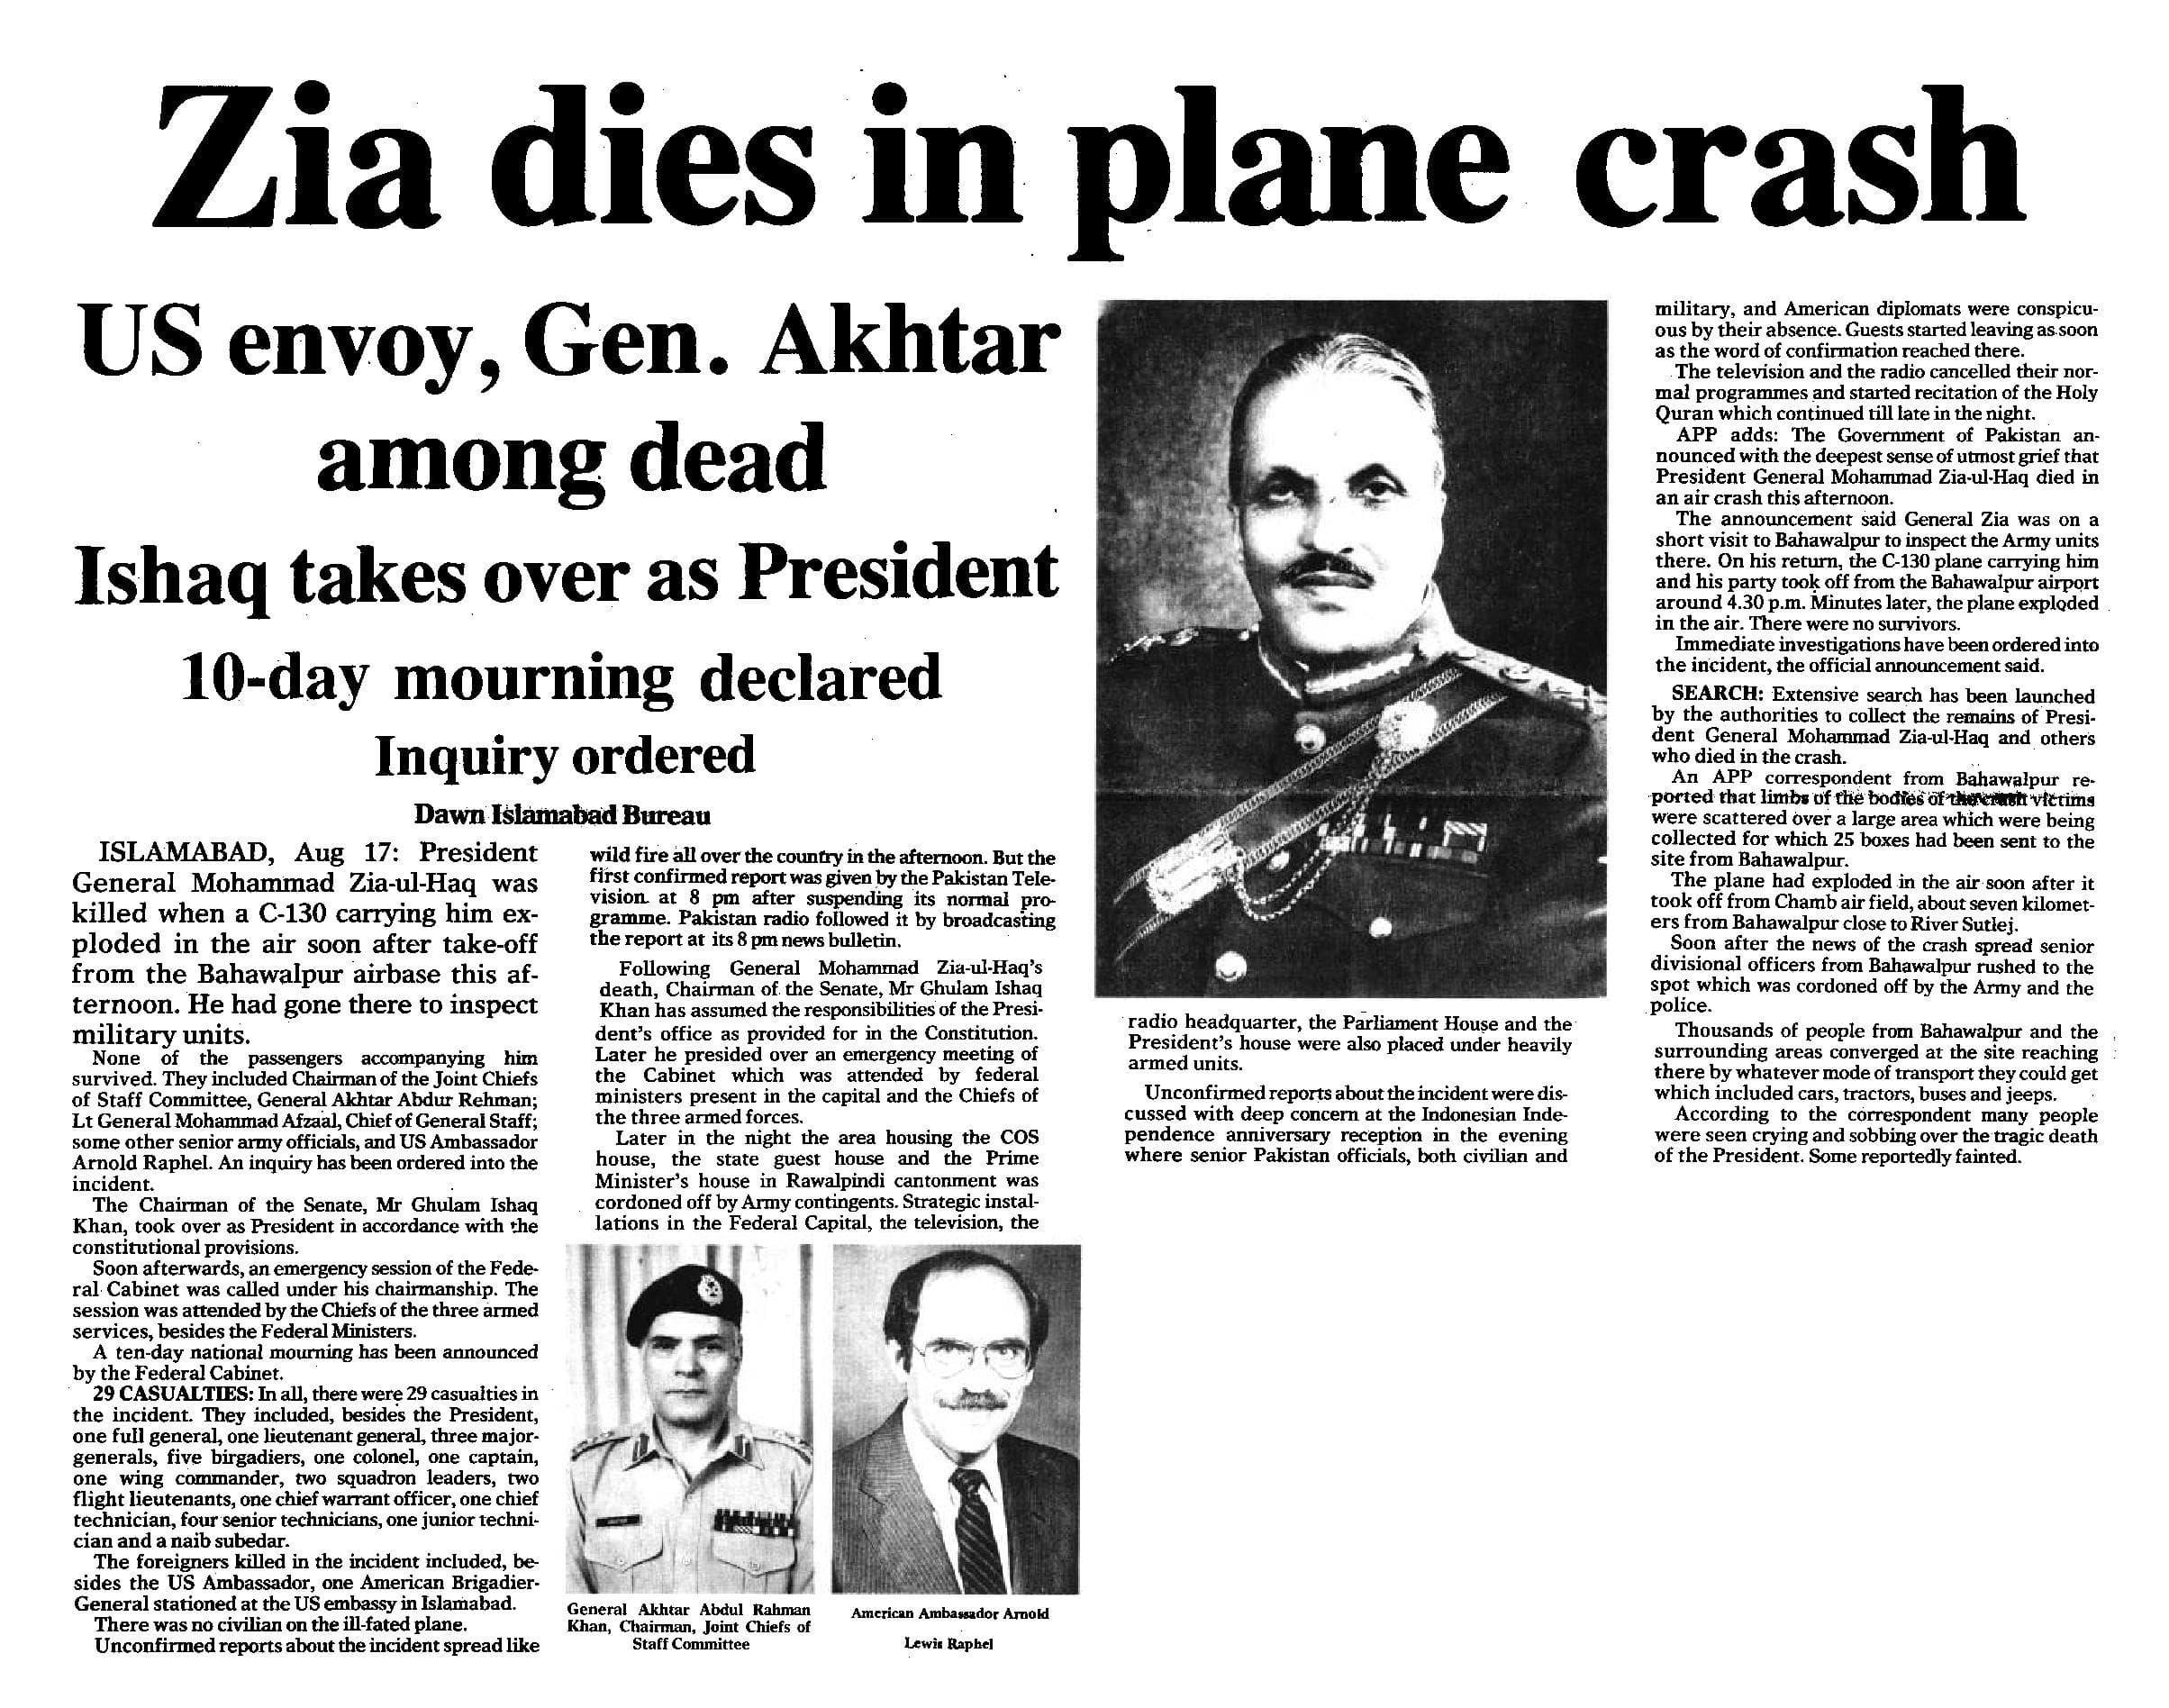 Aug 17, 1988